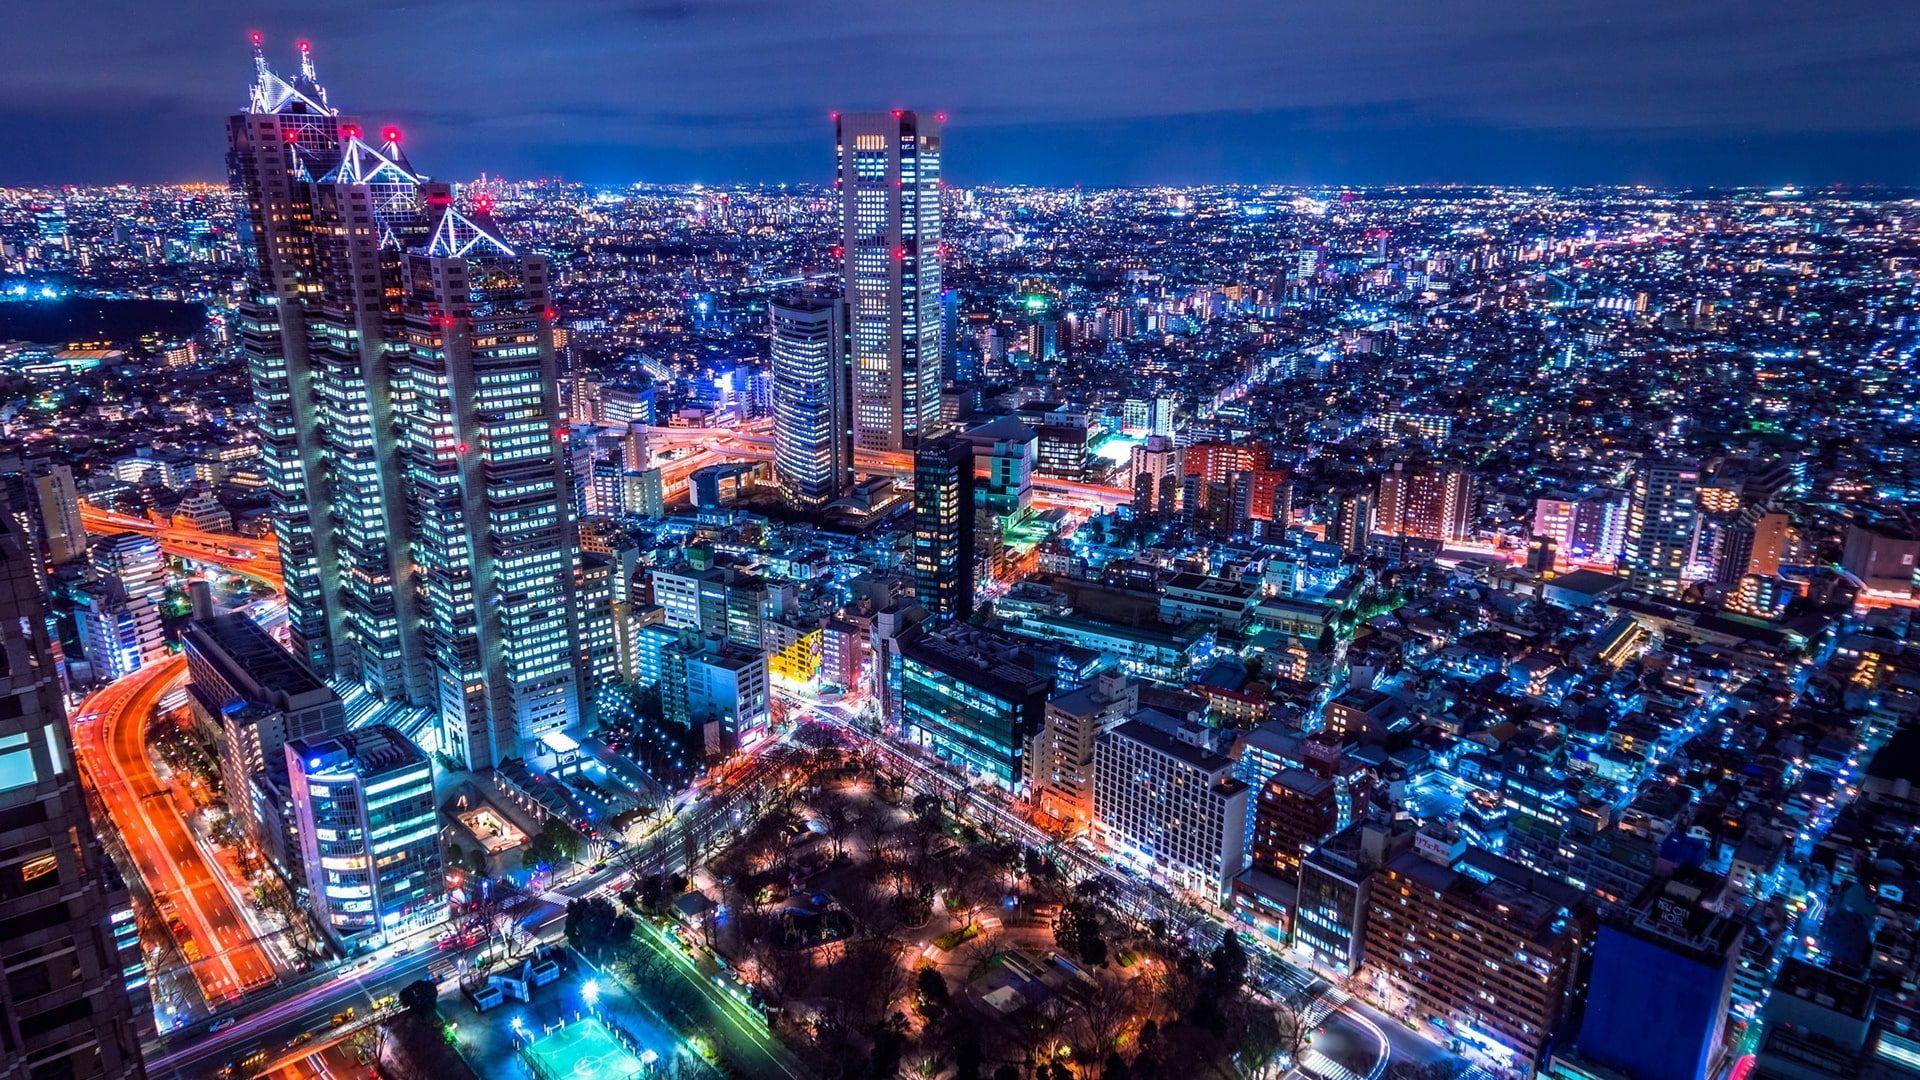 Shinjuku Park Tower Cityscape Shinjuku Japan Metropolis Asia Skyline Night Skyscraper Aerial Photography To Macbook Air Wallpaper Cityscape Metropolis Hd wallpaper city night snow aerial